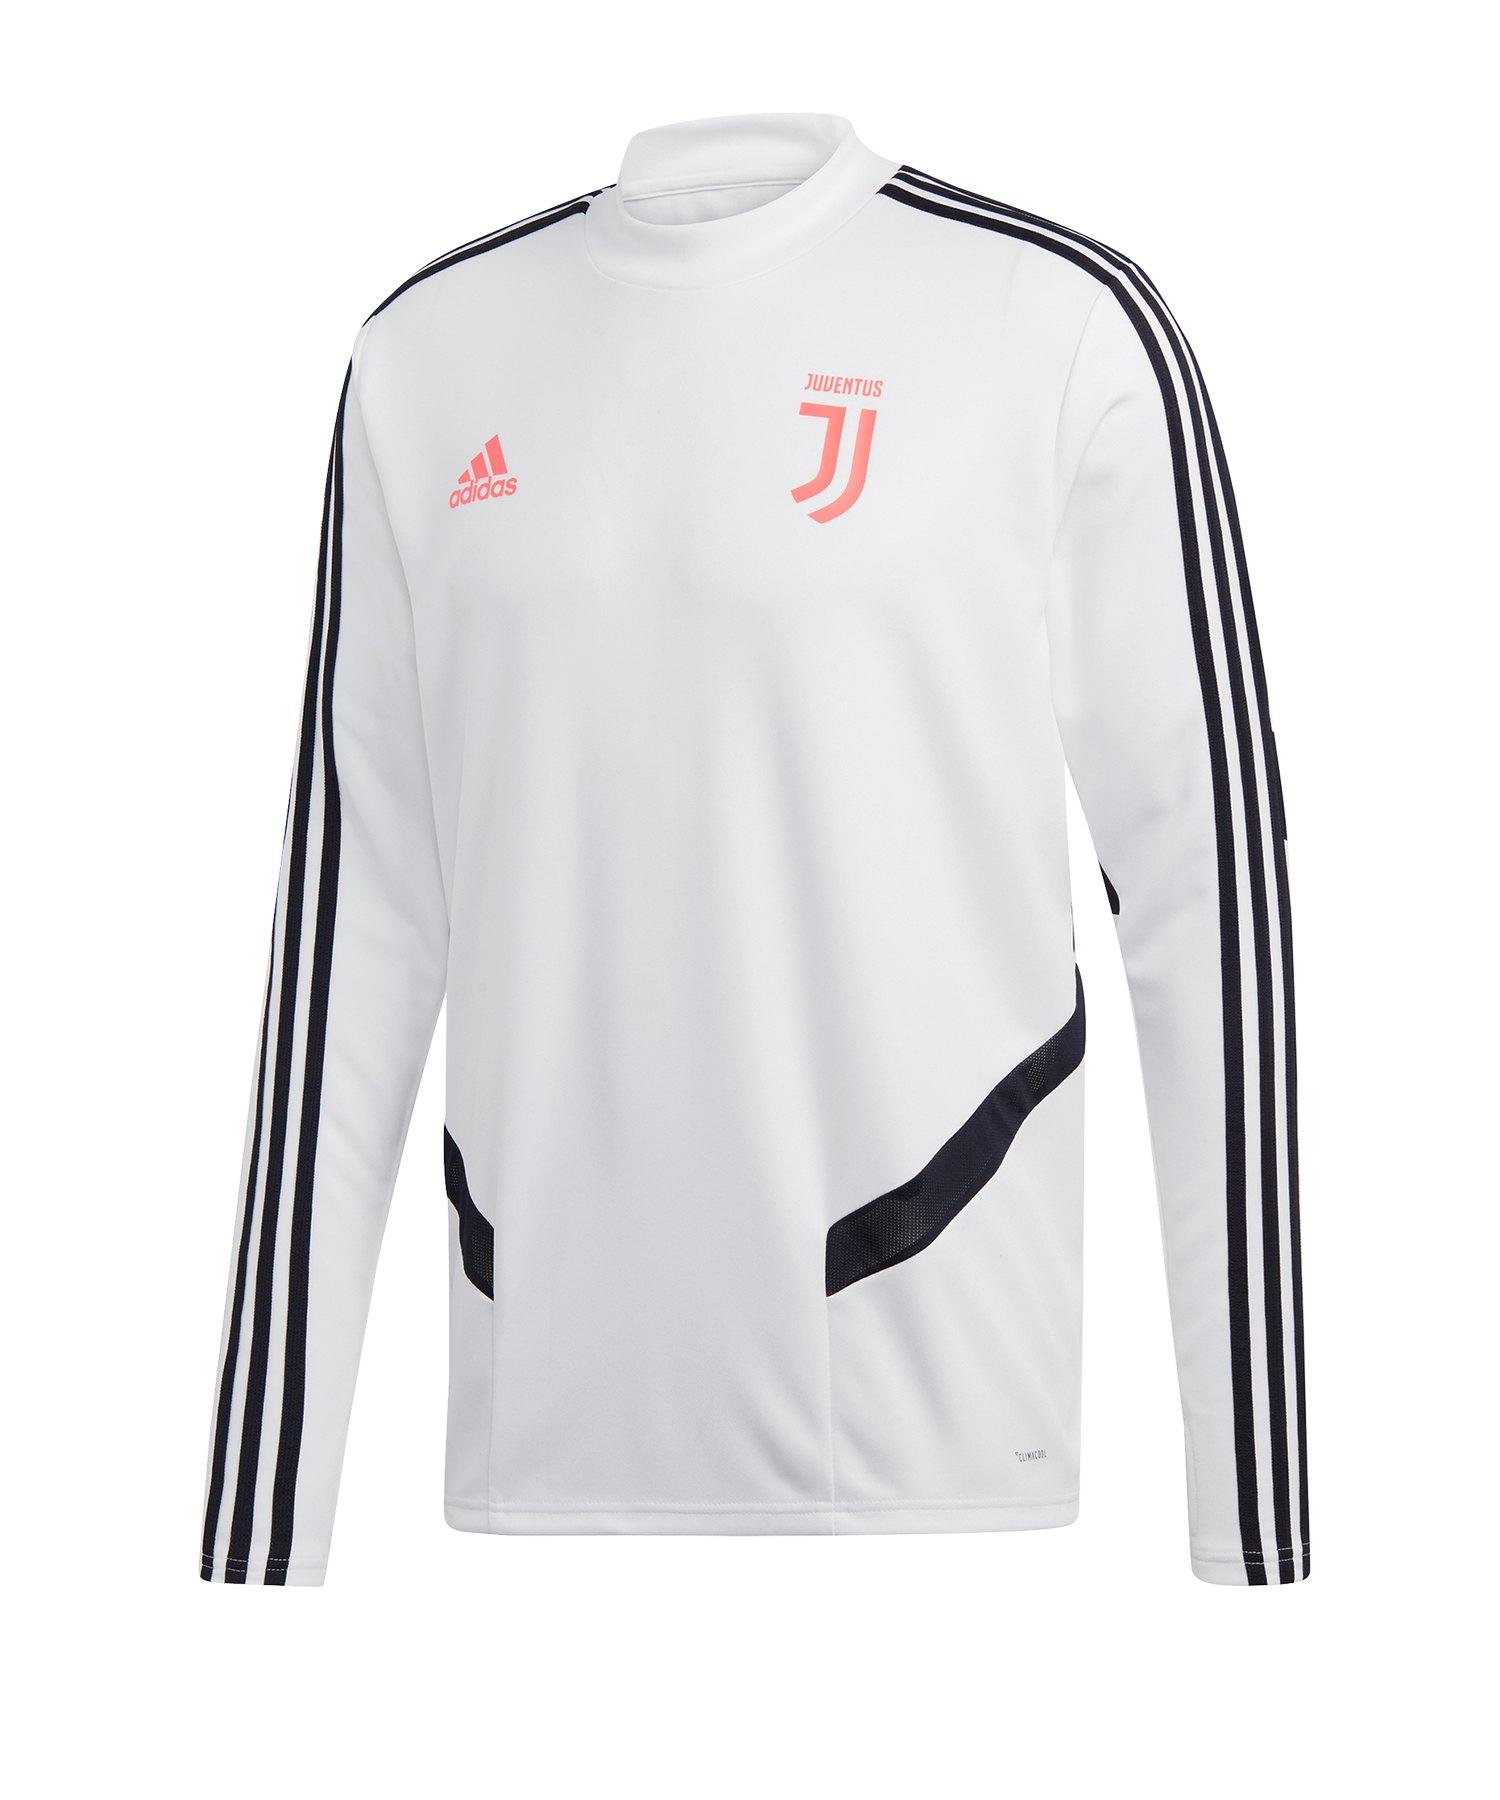 adidas Juventus Turin Trainingstop Weiss Schwarz - Weiss